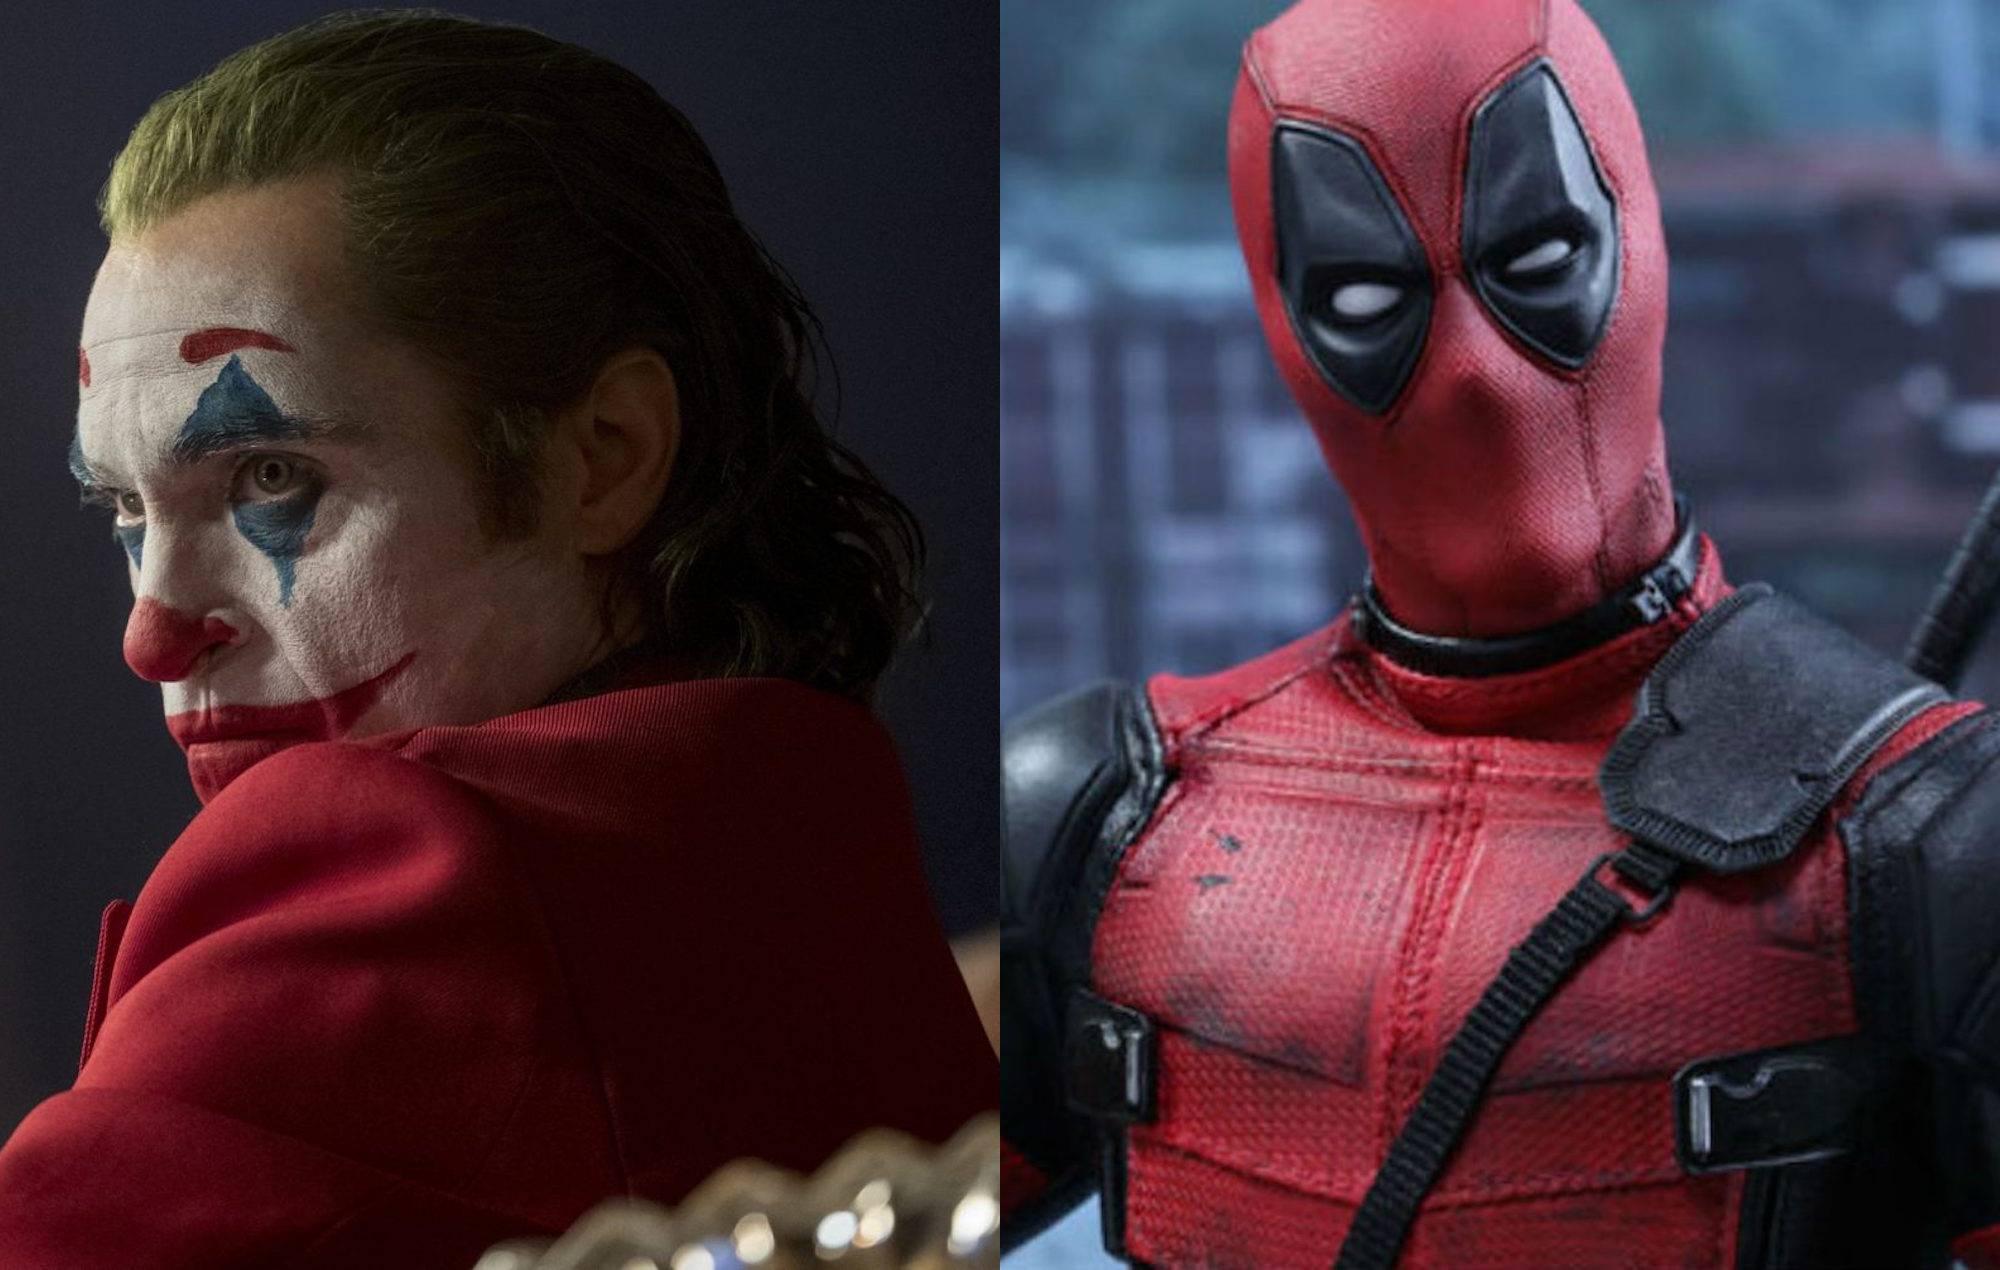 'Joker' has overtaken 'Deadpool' as highest grossing R-rated movie ever